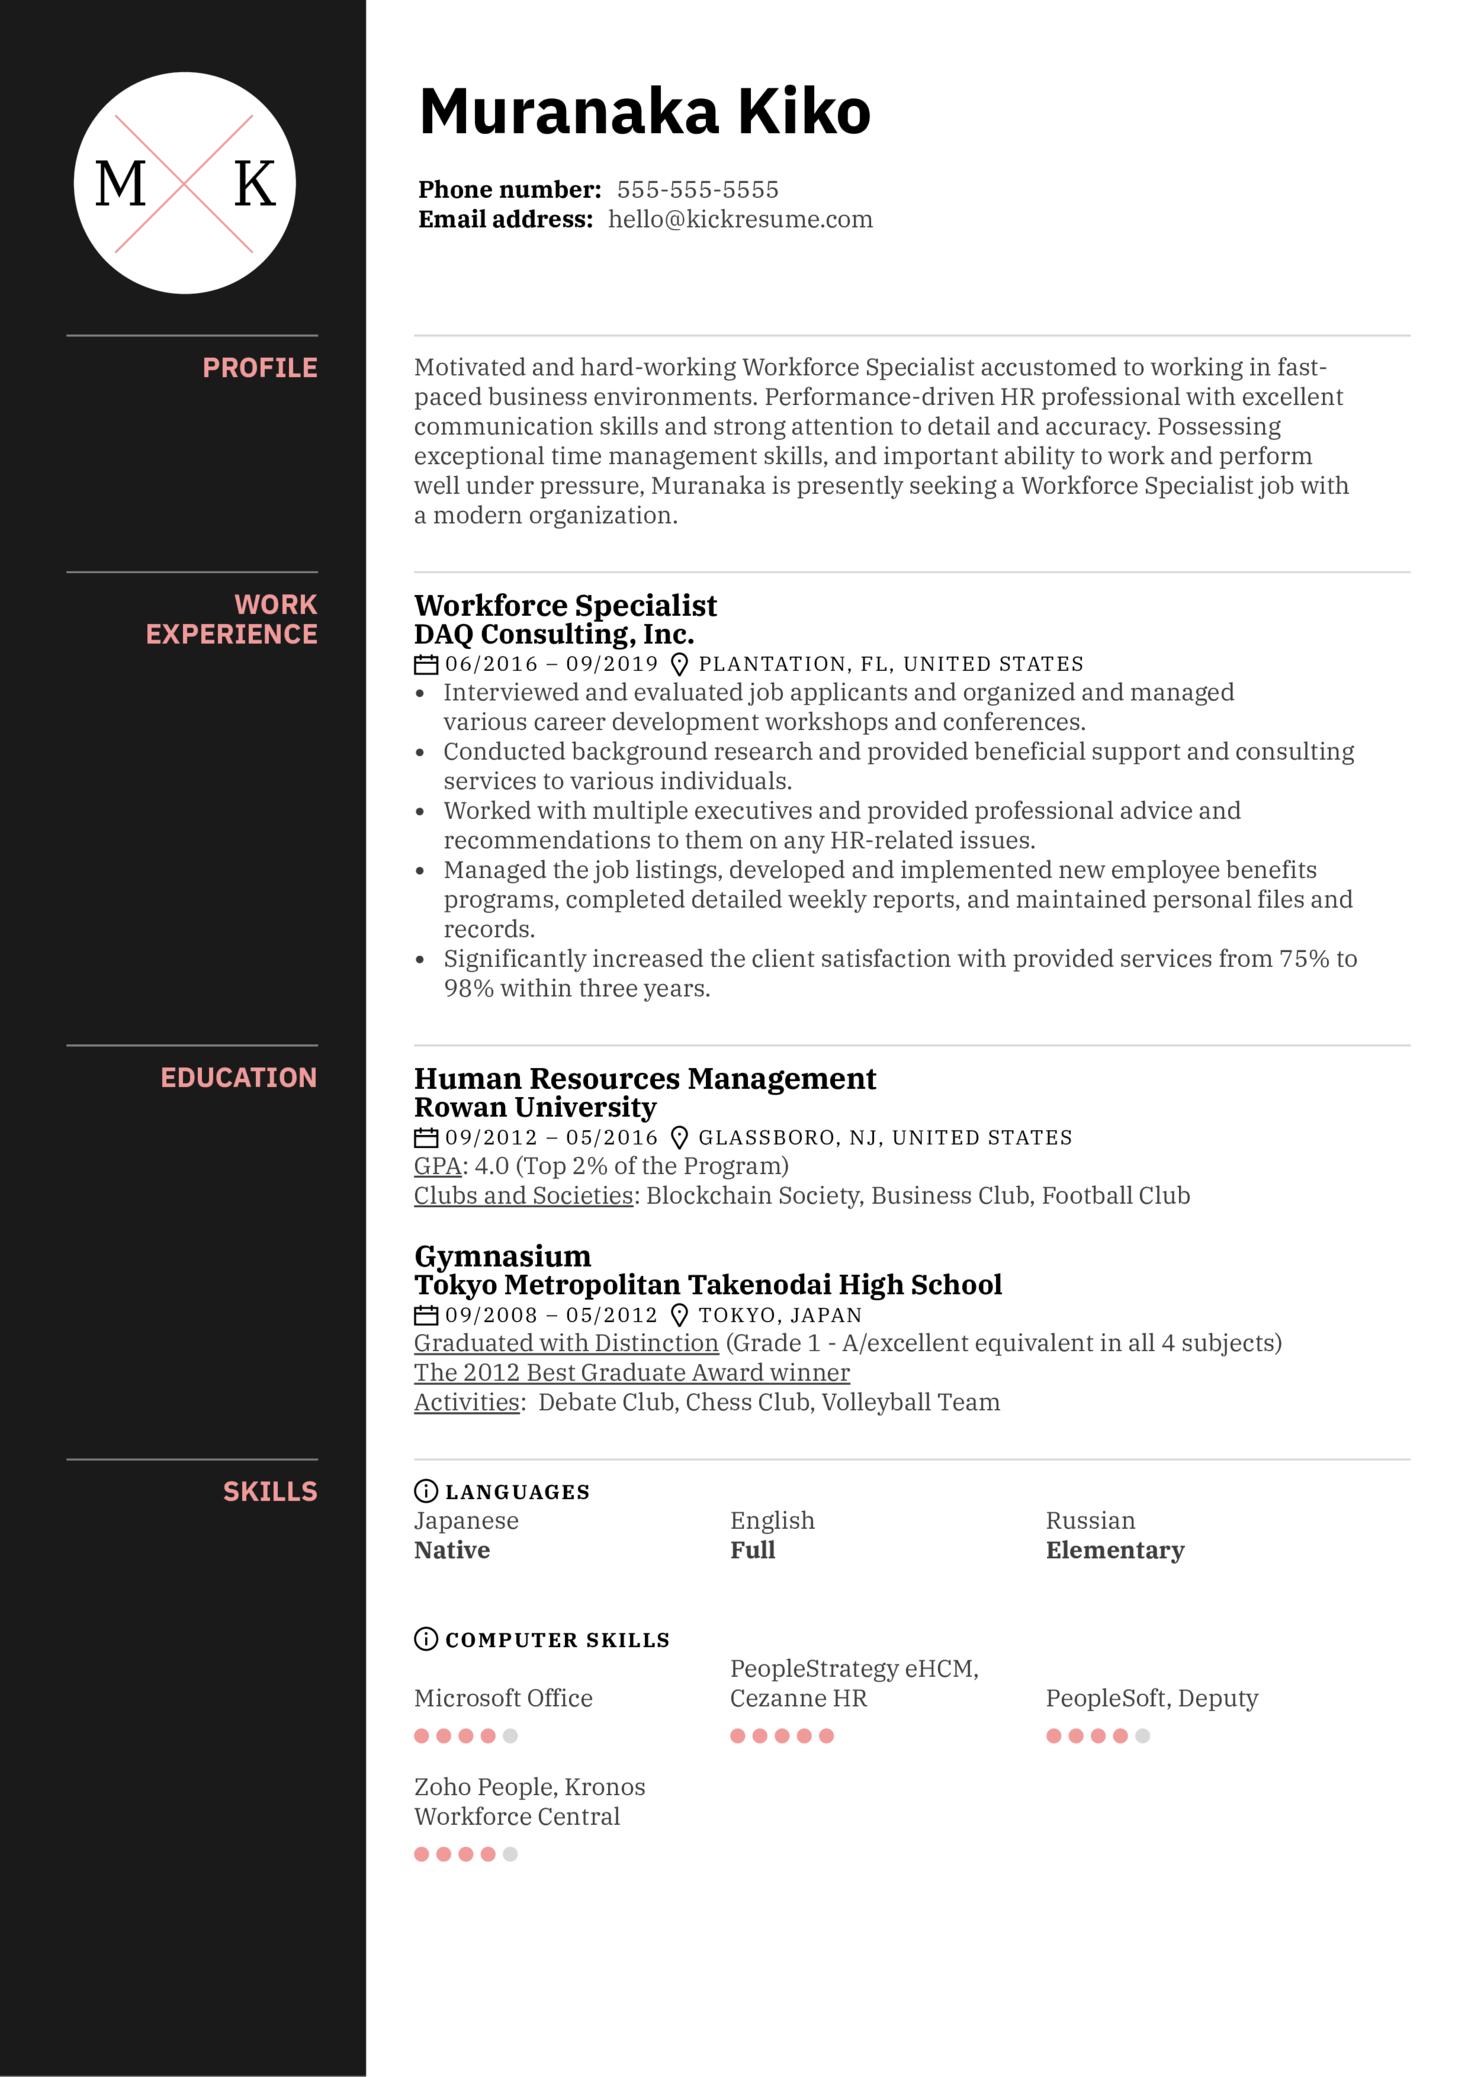 Resume Examples by Real People: Workforce Specialist Resume ...